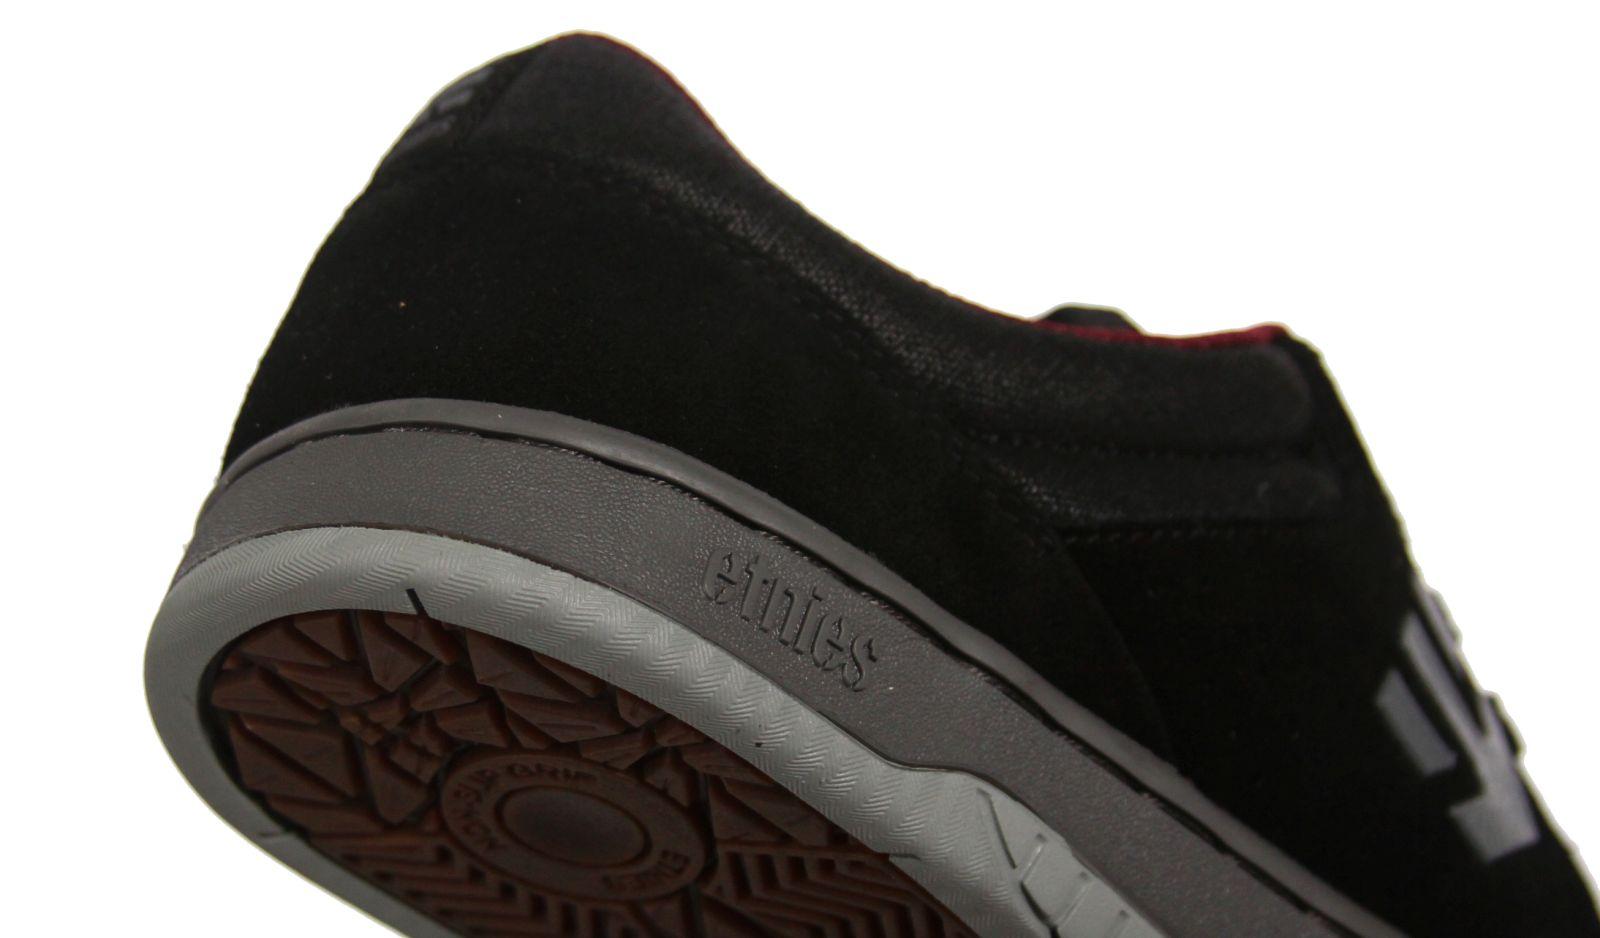 Buty Etnies Marana (Black / Dark Grey / Grey) Sp16